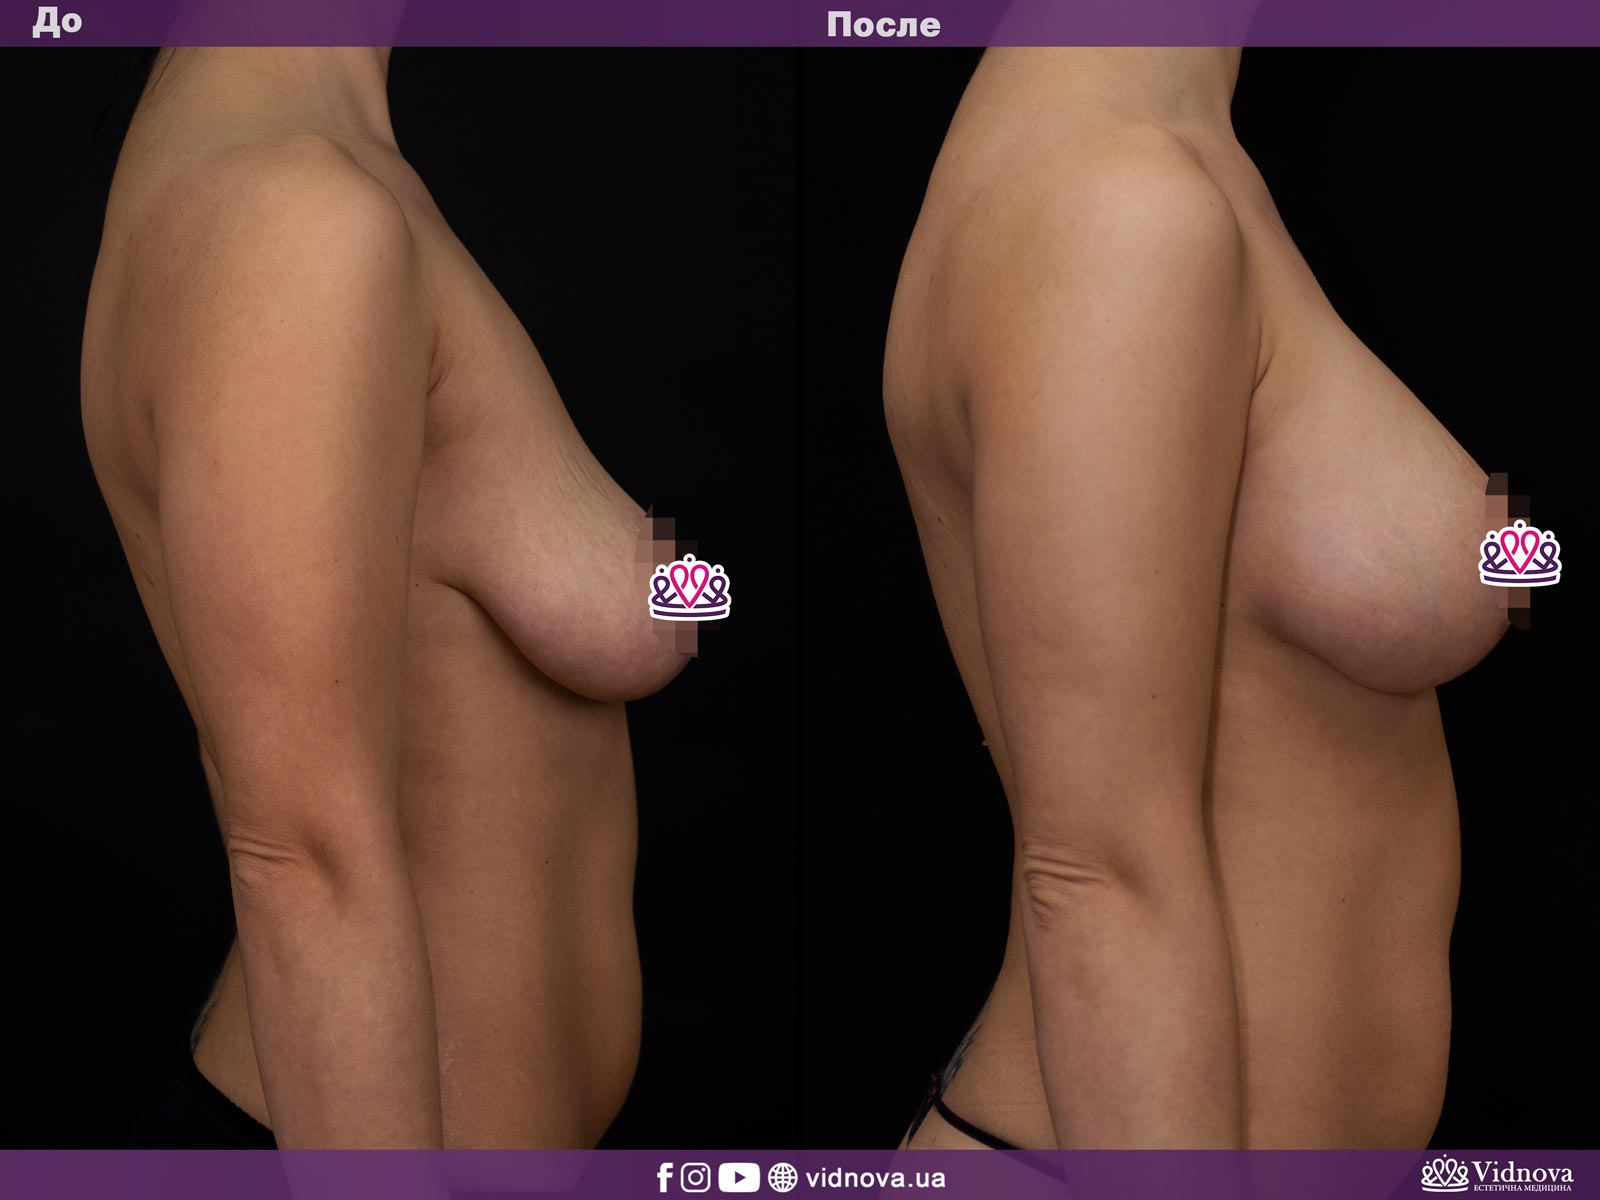 Подтяжка груди: Фото ДО и ПОСЛЕ - Пример №1-3 - Клиника Vidnova